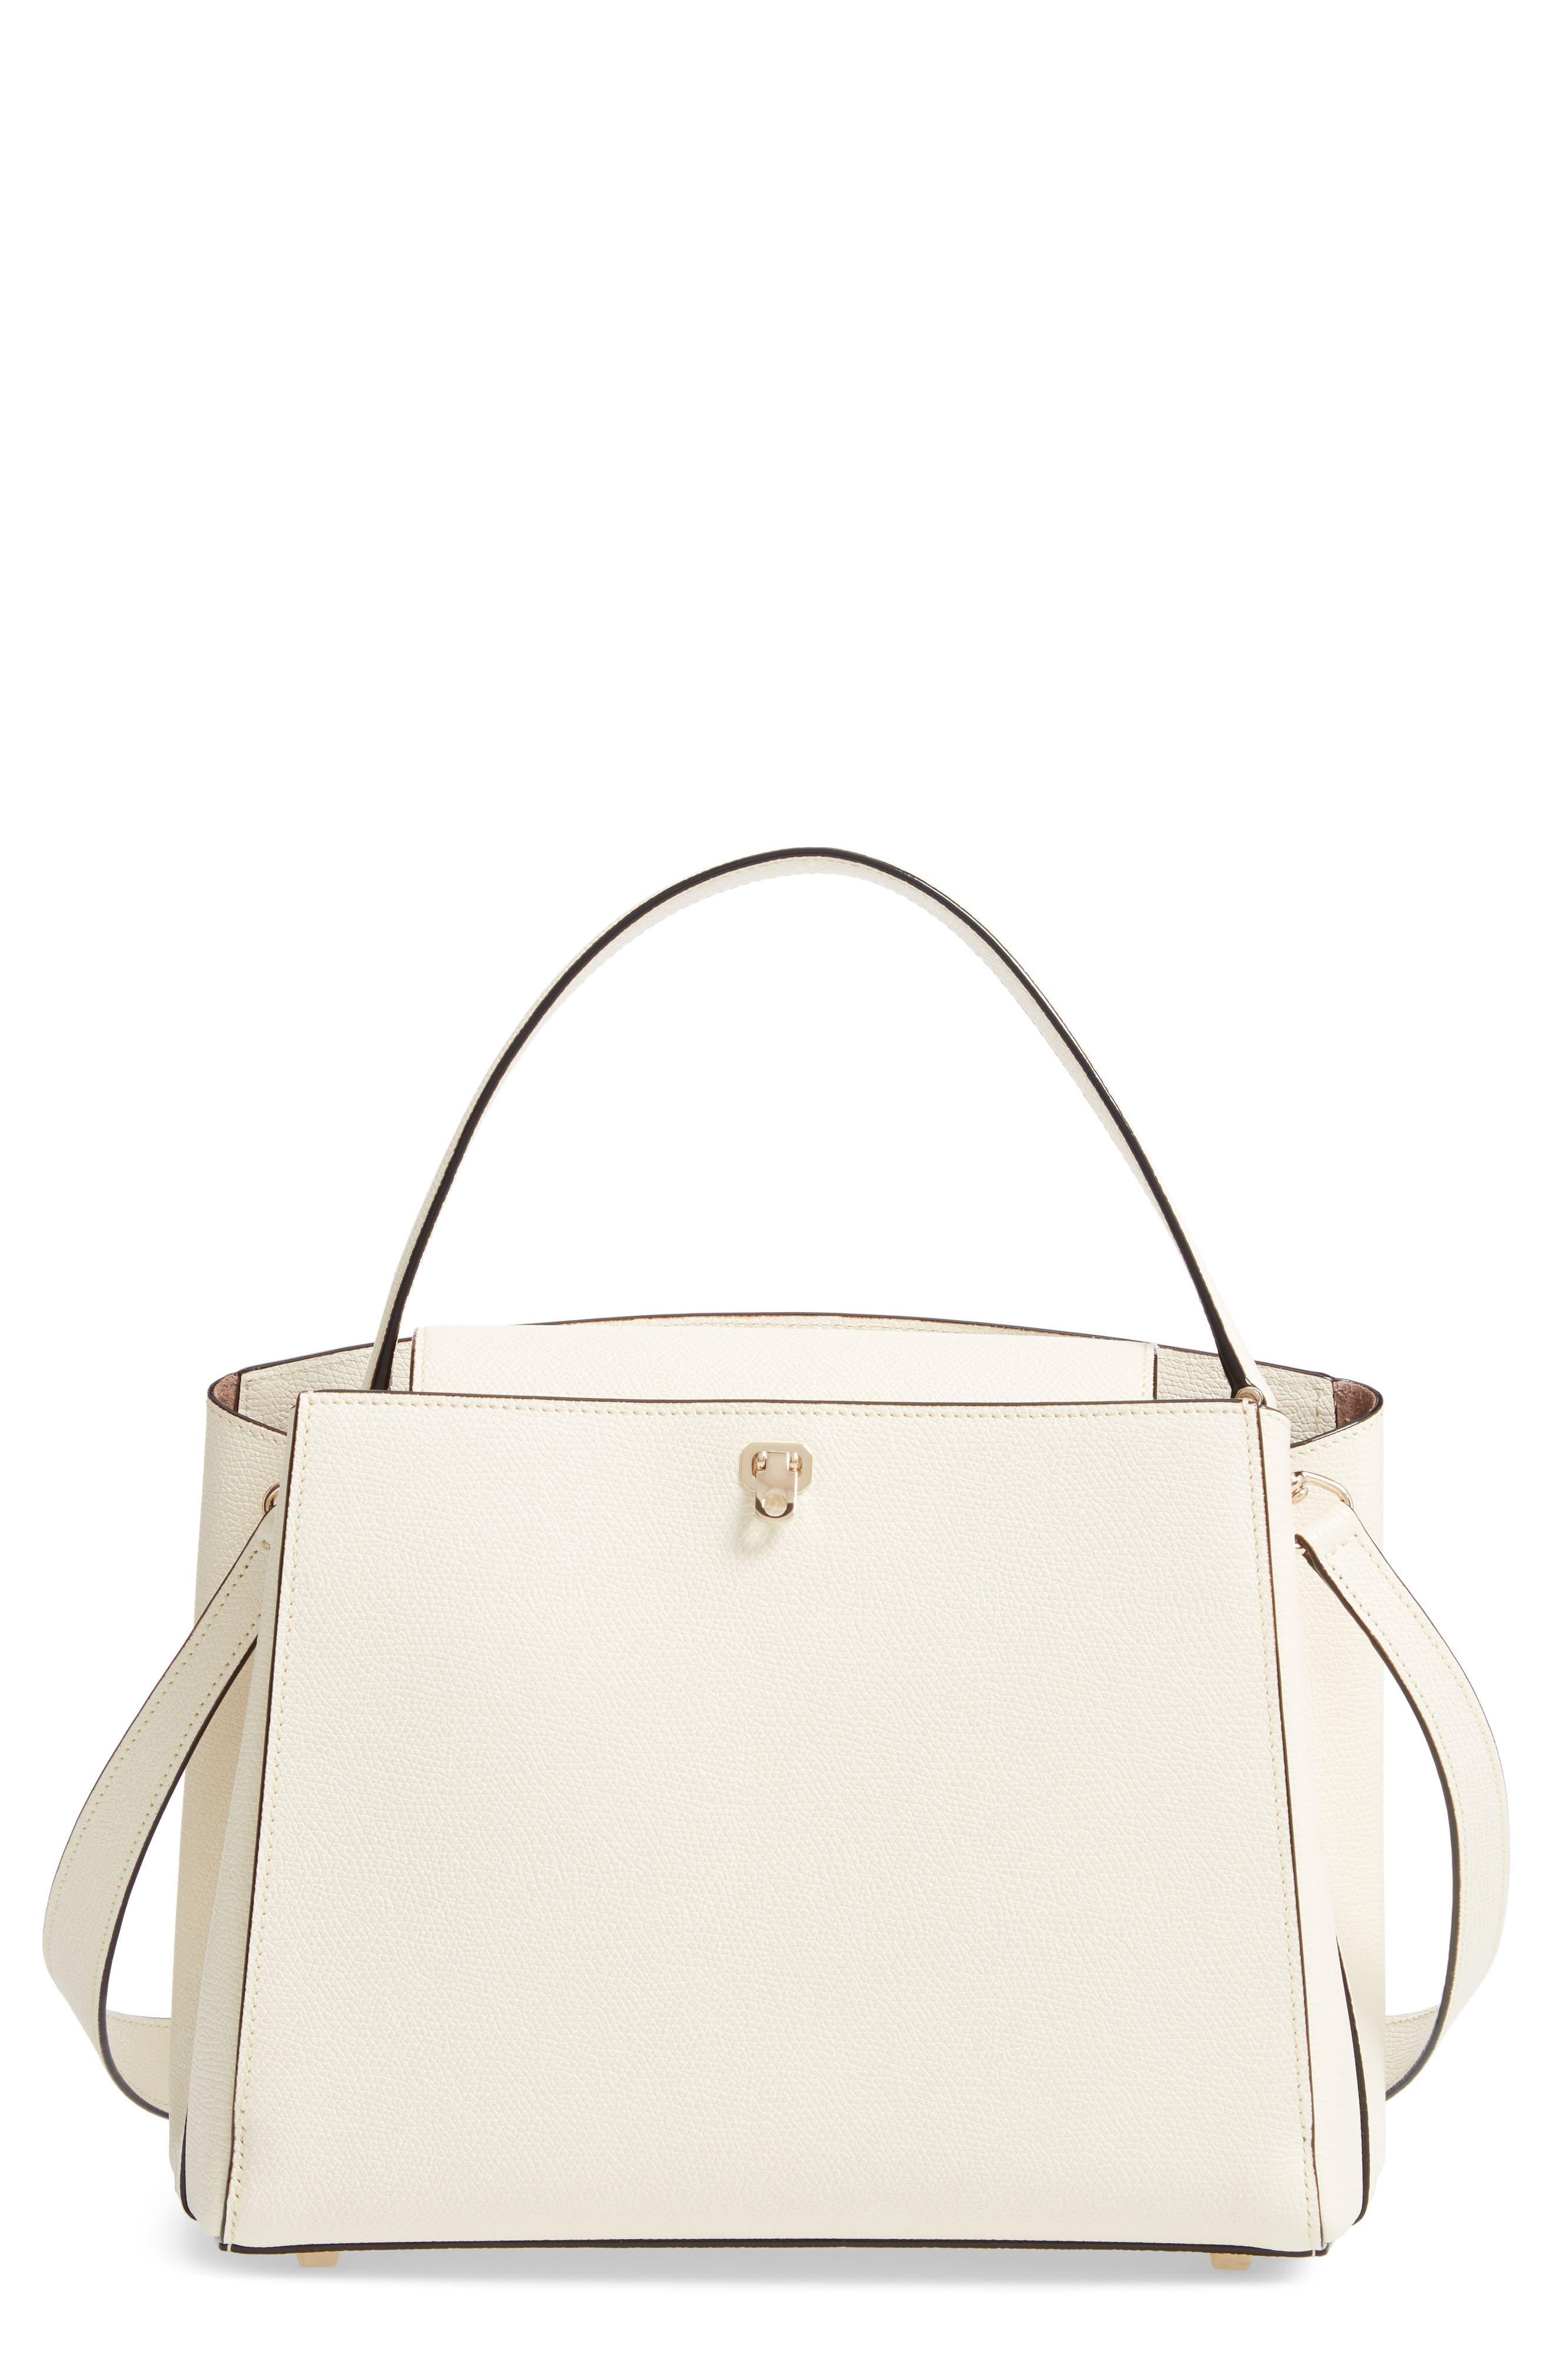 Medium Brera Leather Top Handle Bag - White